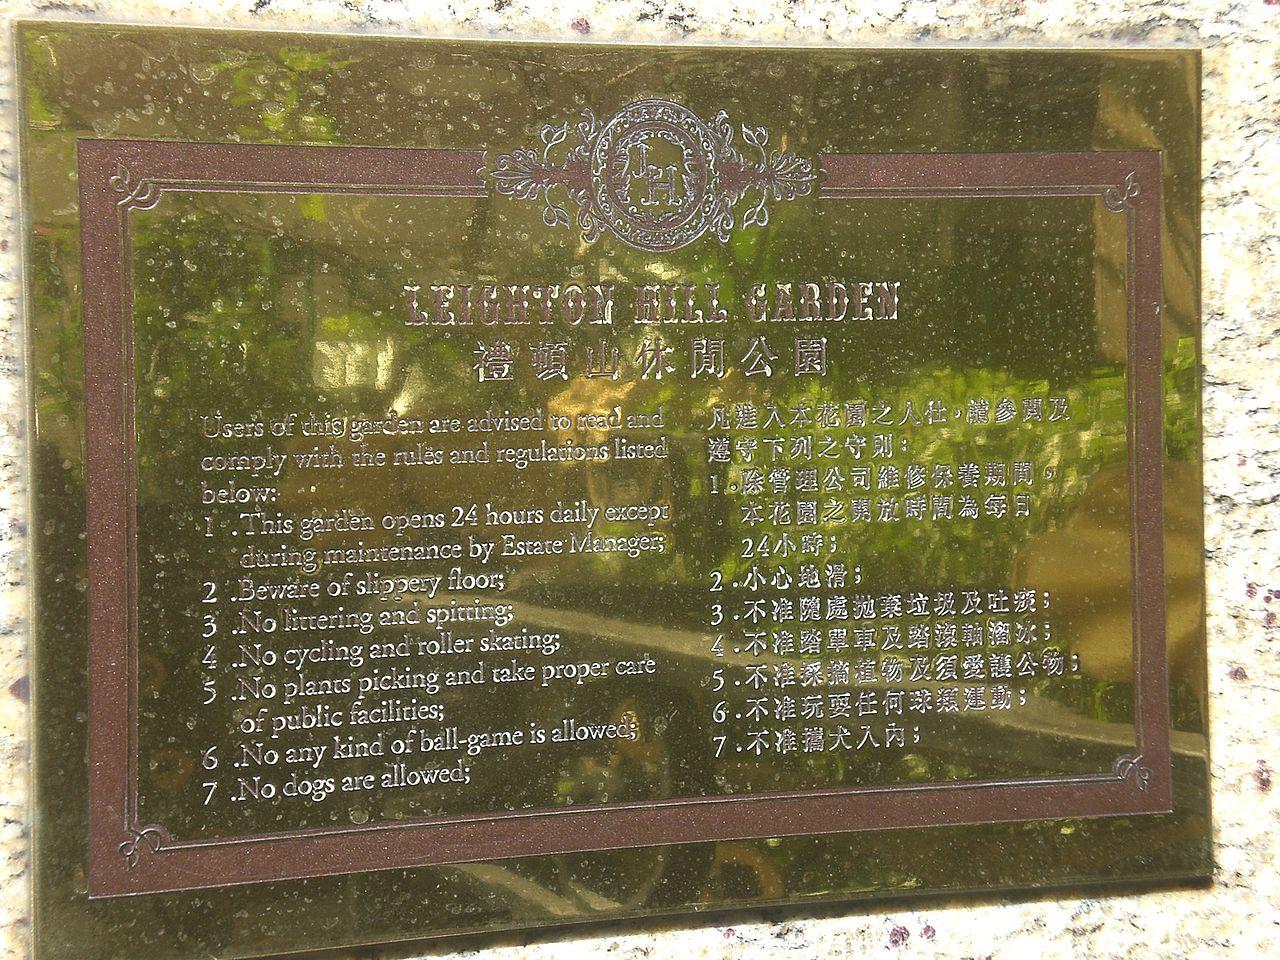 File:HK CWB The Leighton Hill Public Garden Rules 1.JPG - Wikimedia ...